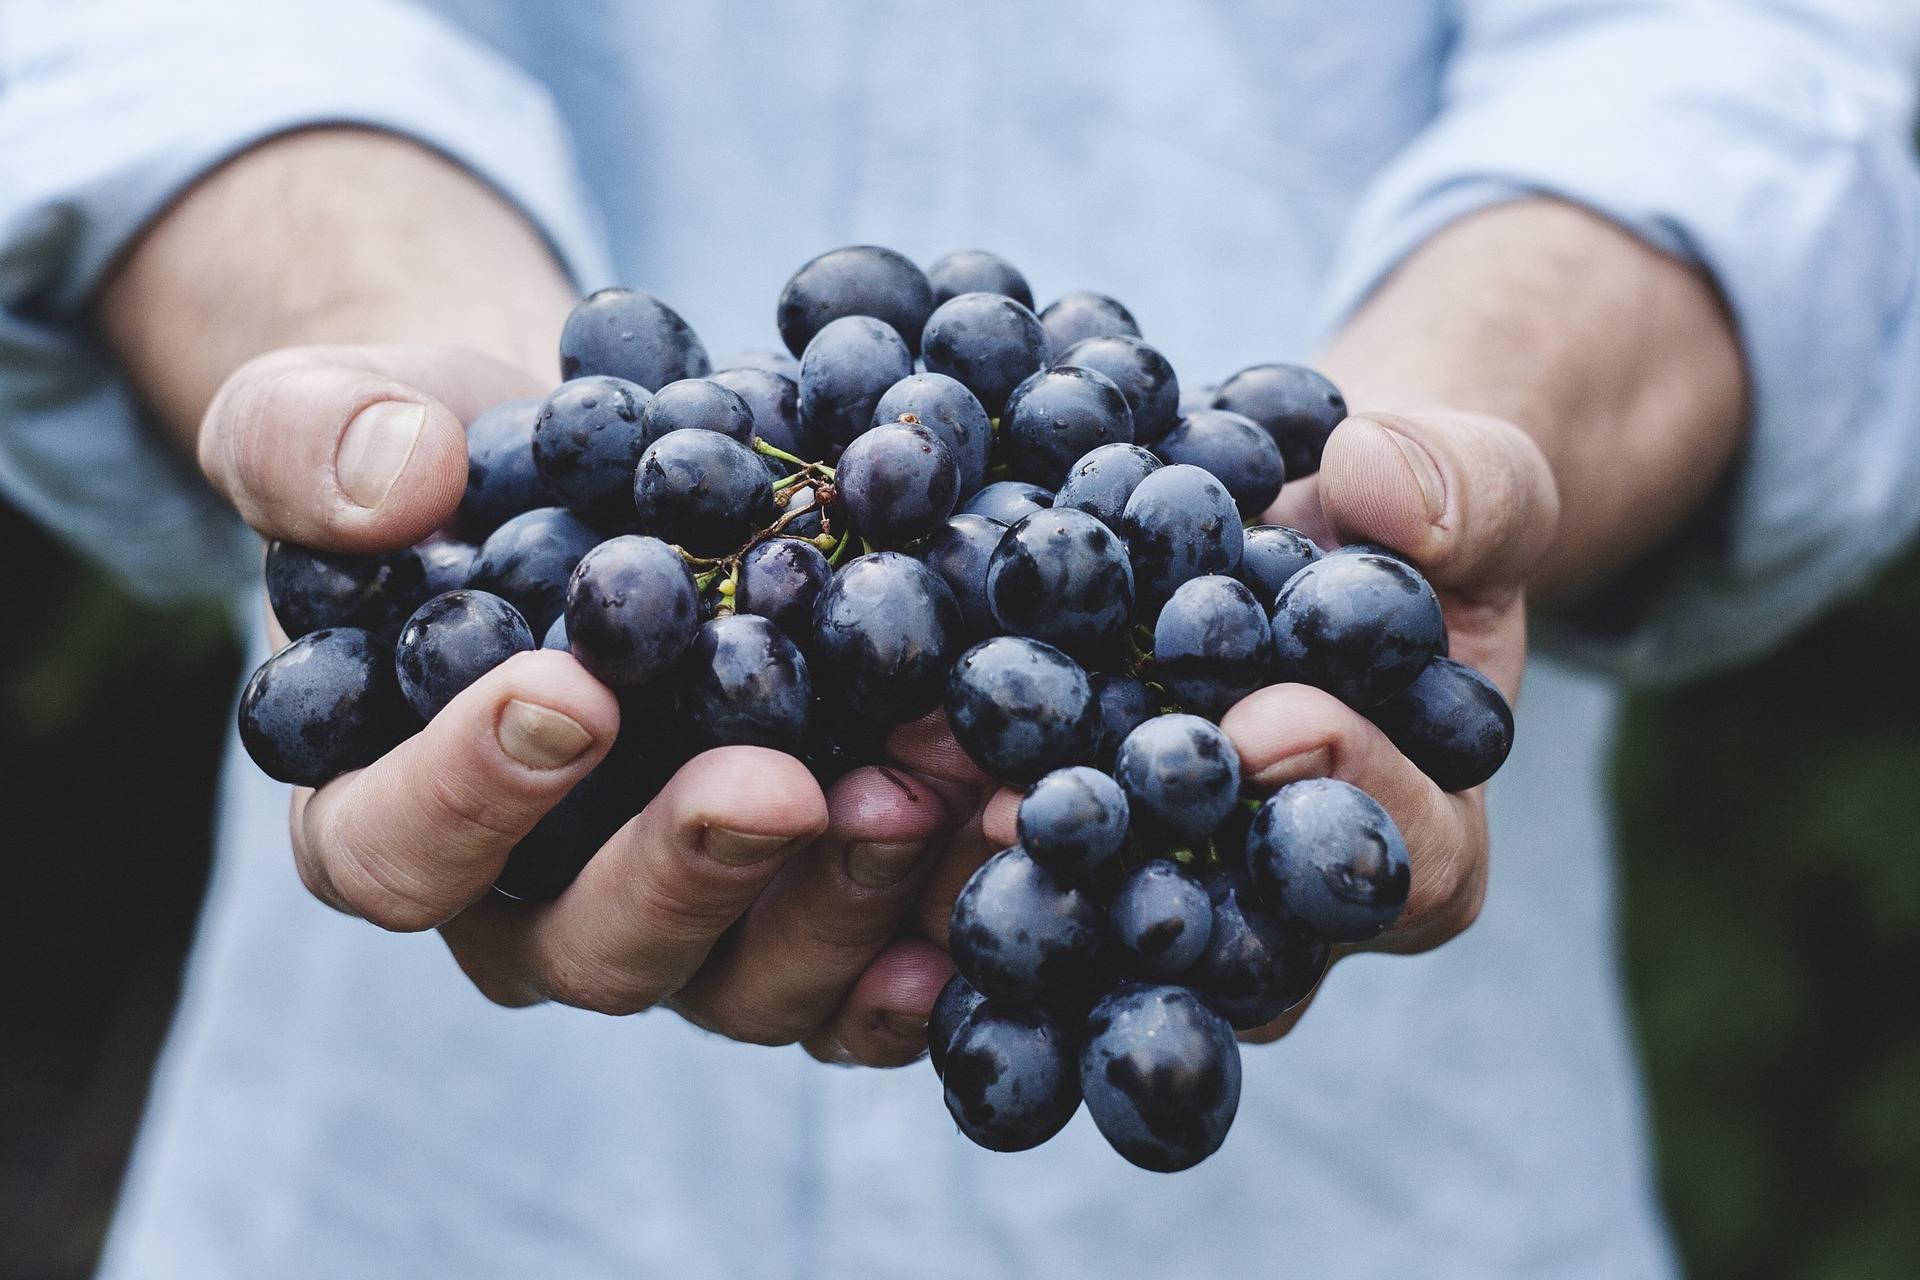 Vjerovanja za Vincekovo: Ako sunce peče, obilno vino teče...